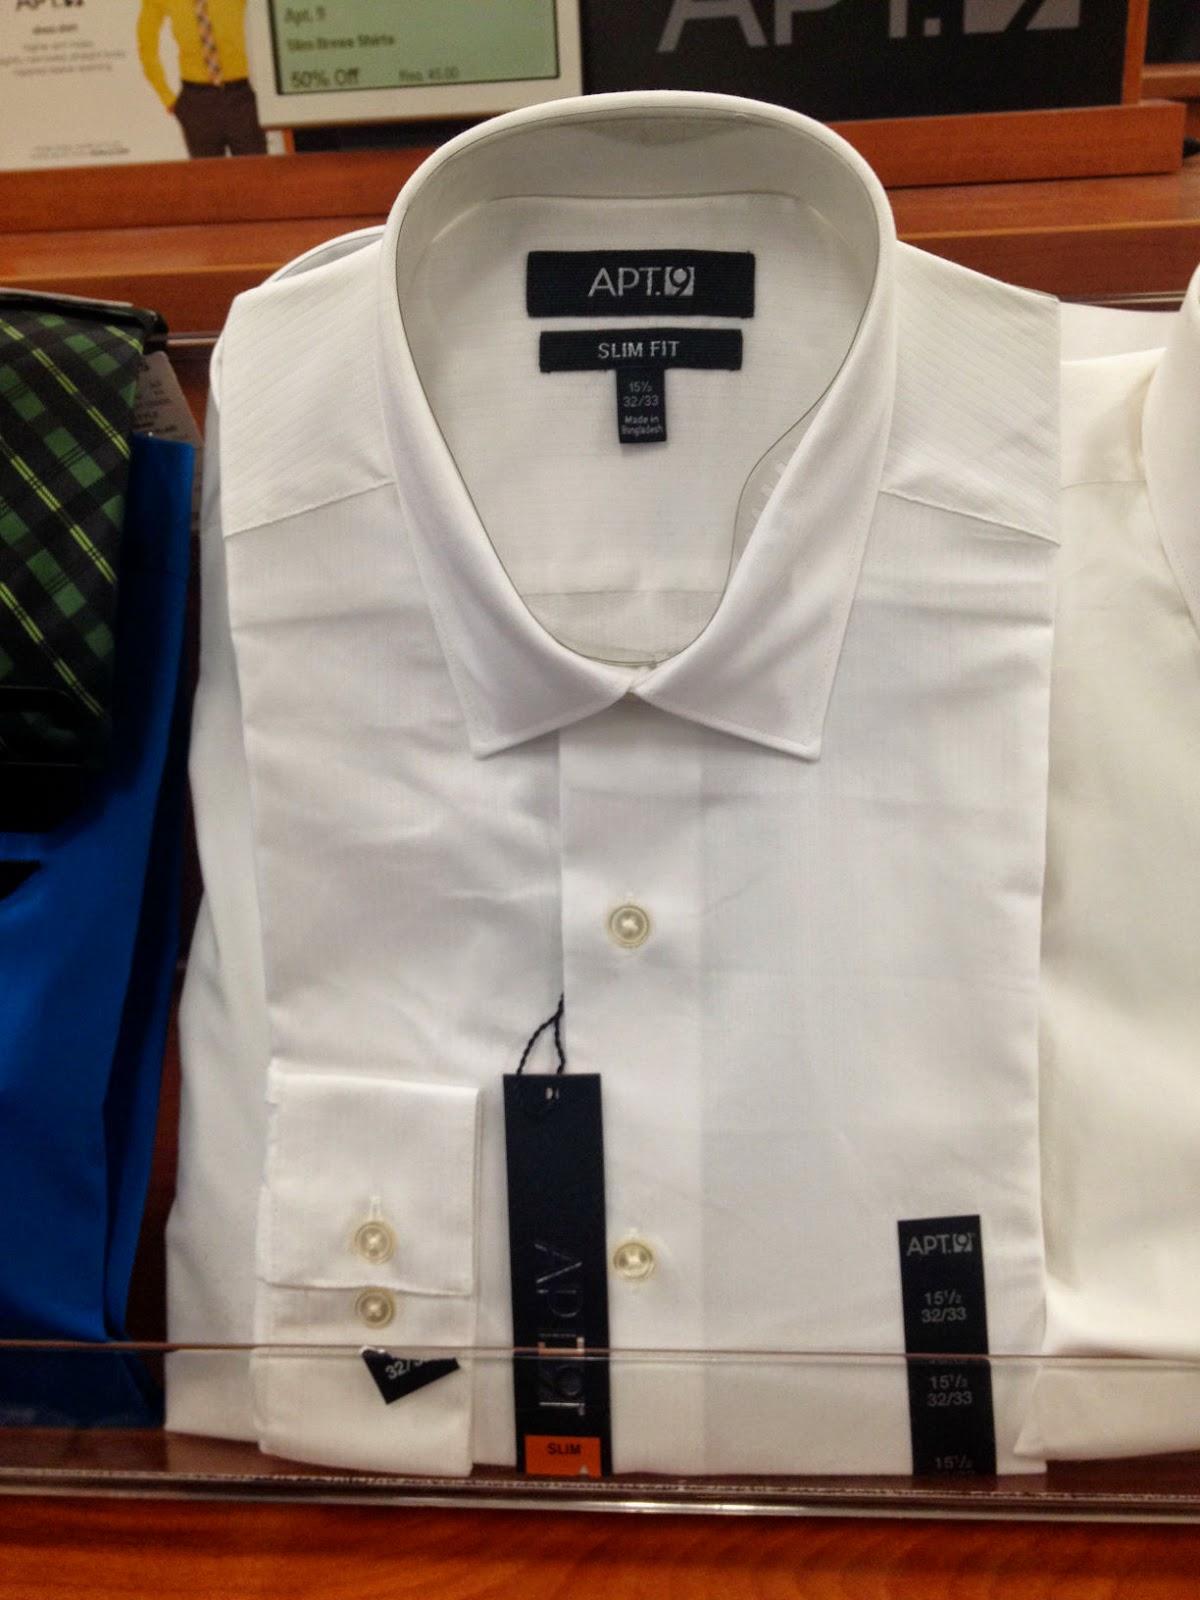 Product of bangladesh apt 9 men 39 s white dress shirt for Apartment 9 dress shirts